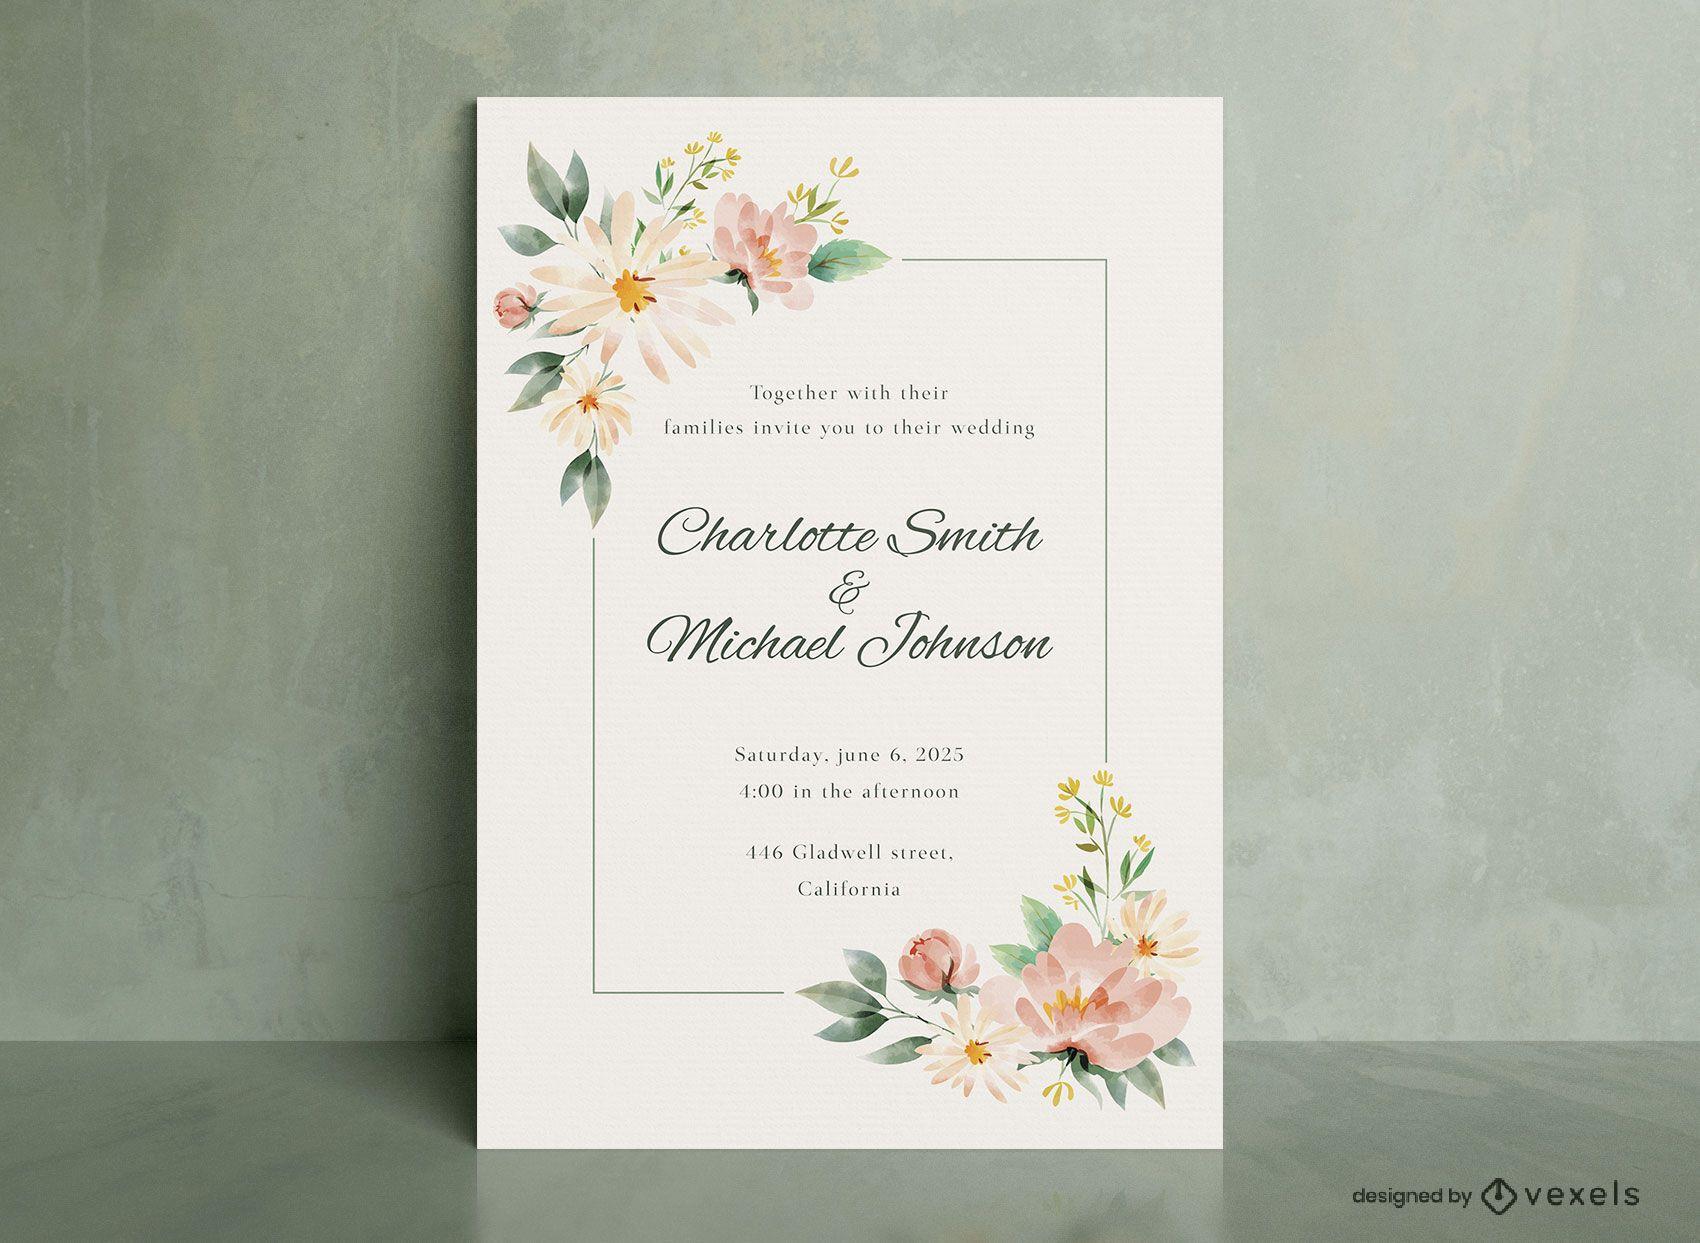 Invitación de boda flores acuarela